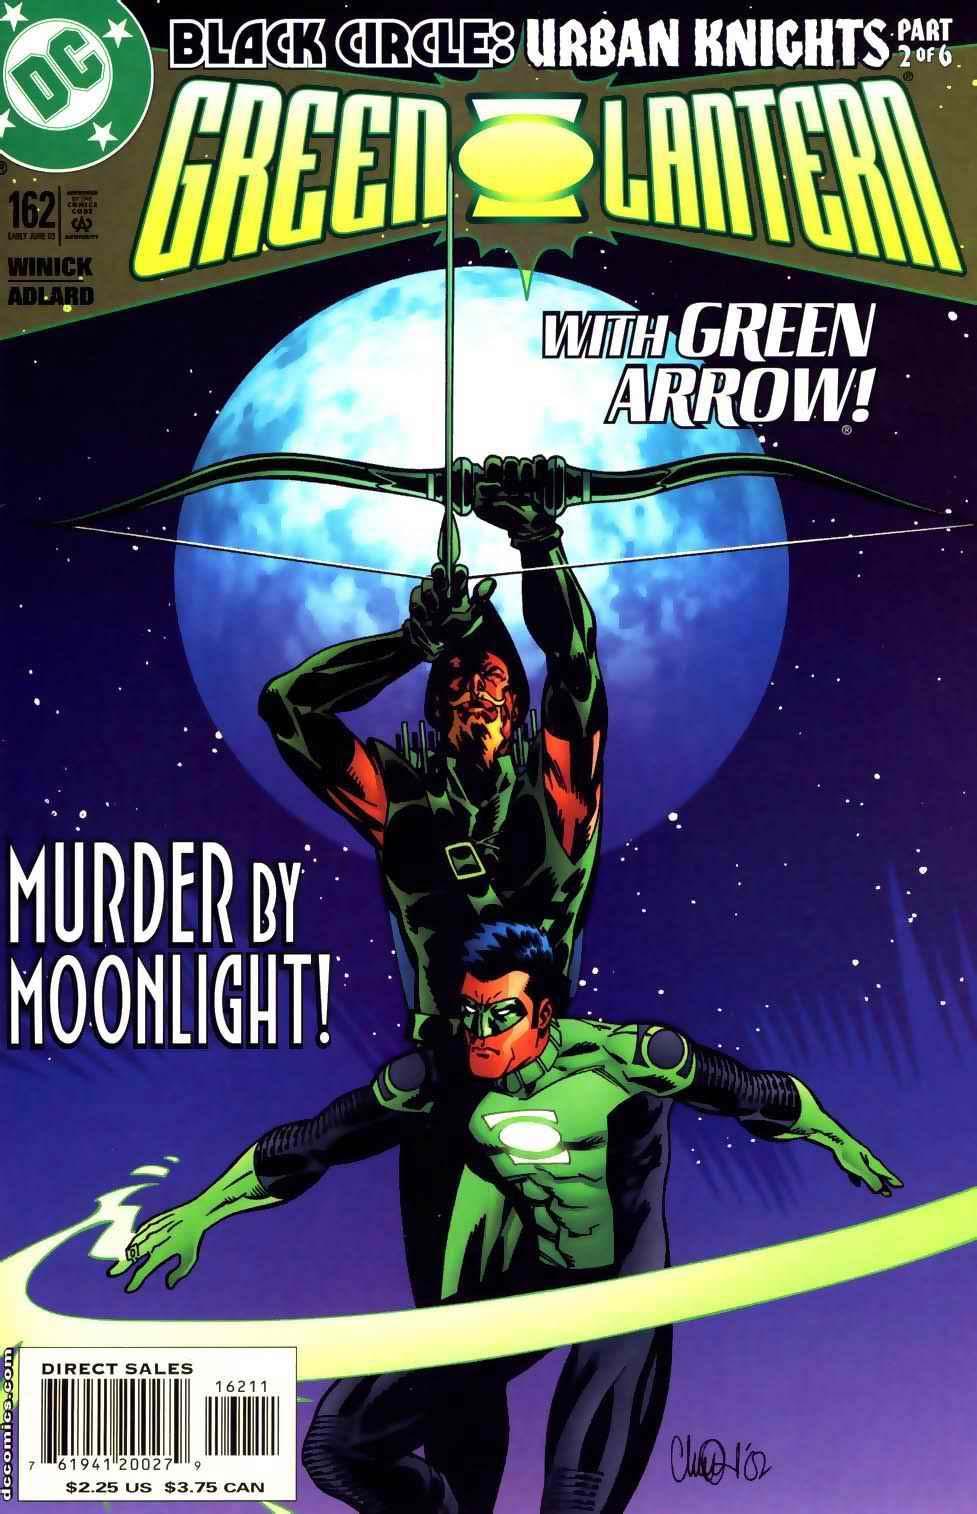 Green Lantern v3 162 - part 2 (01).jpg